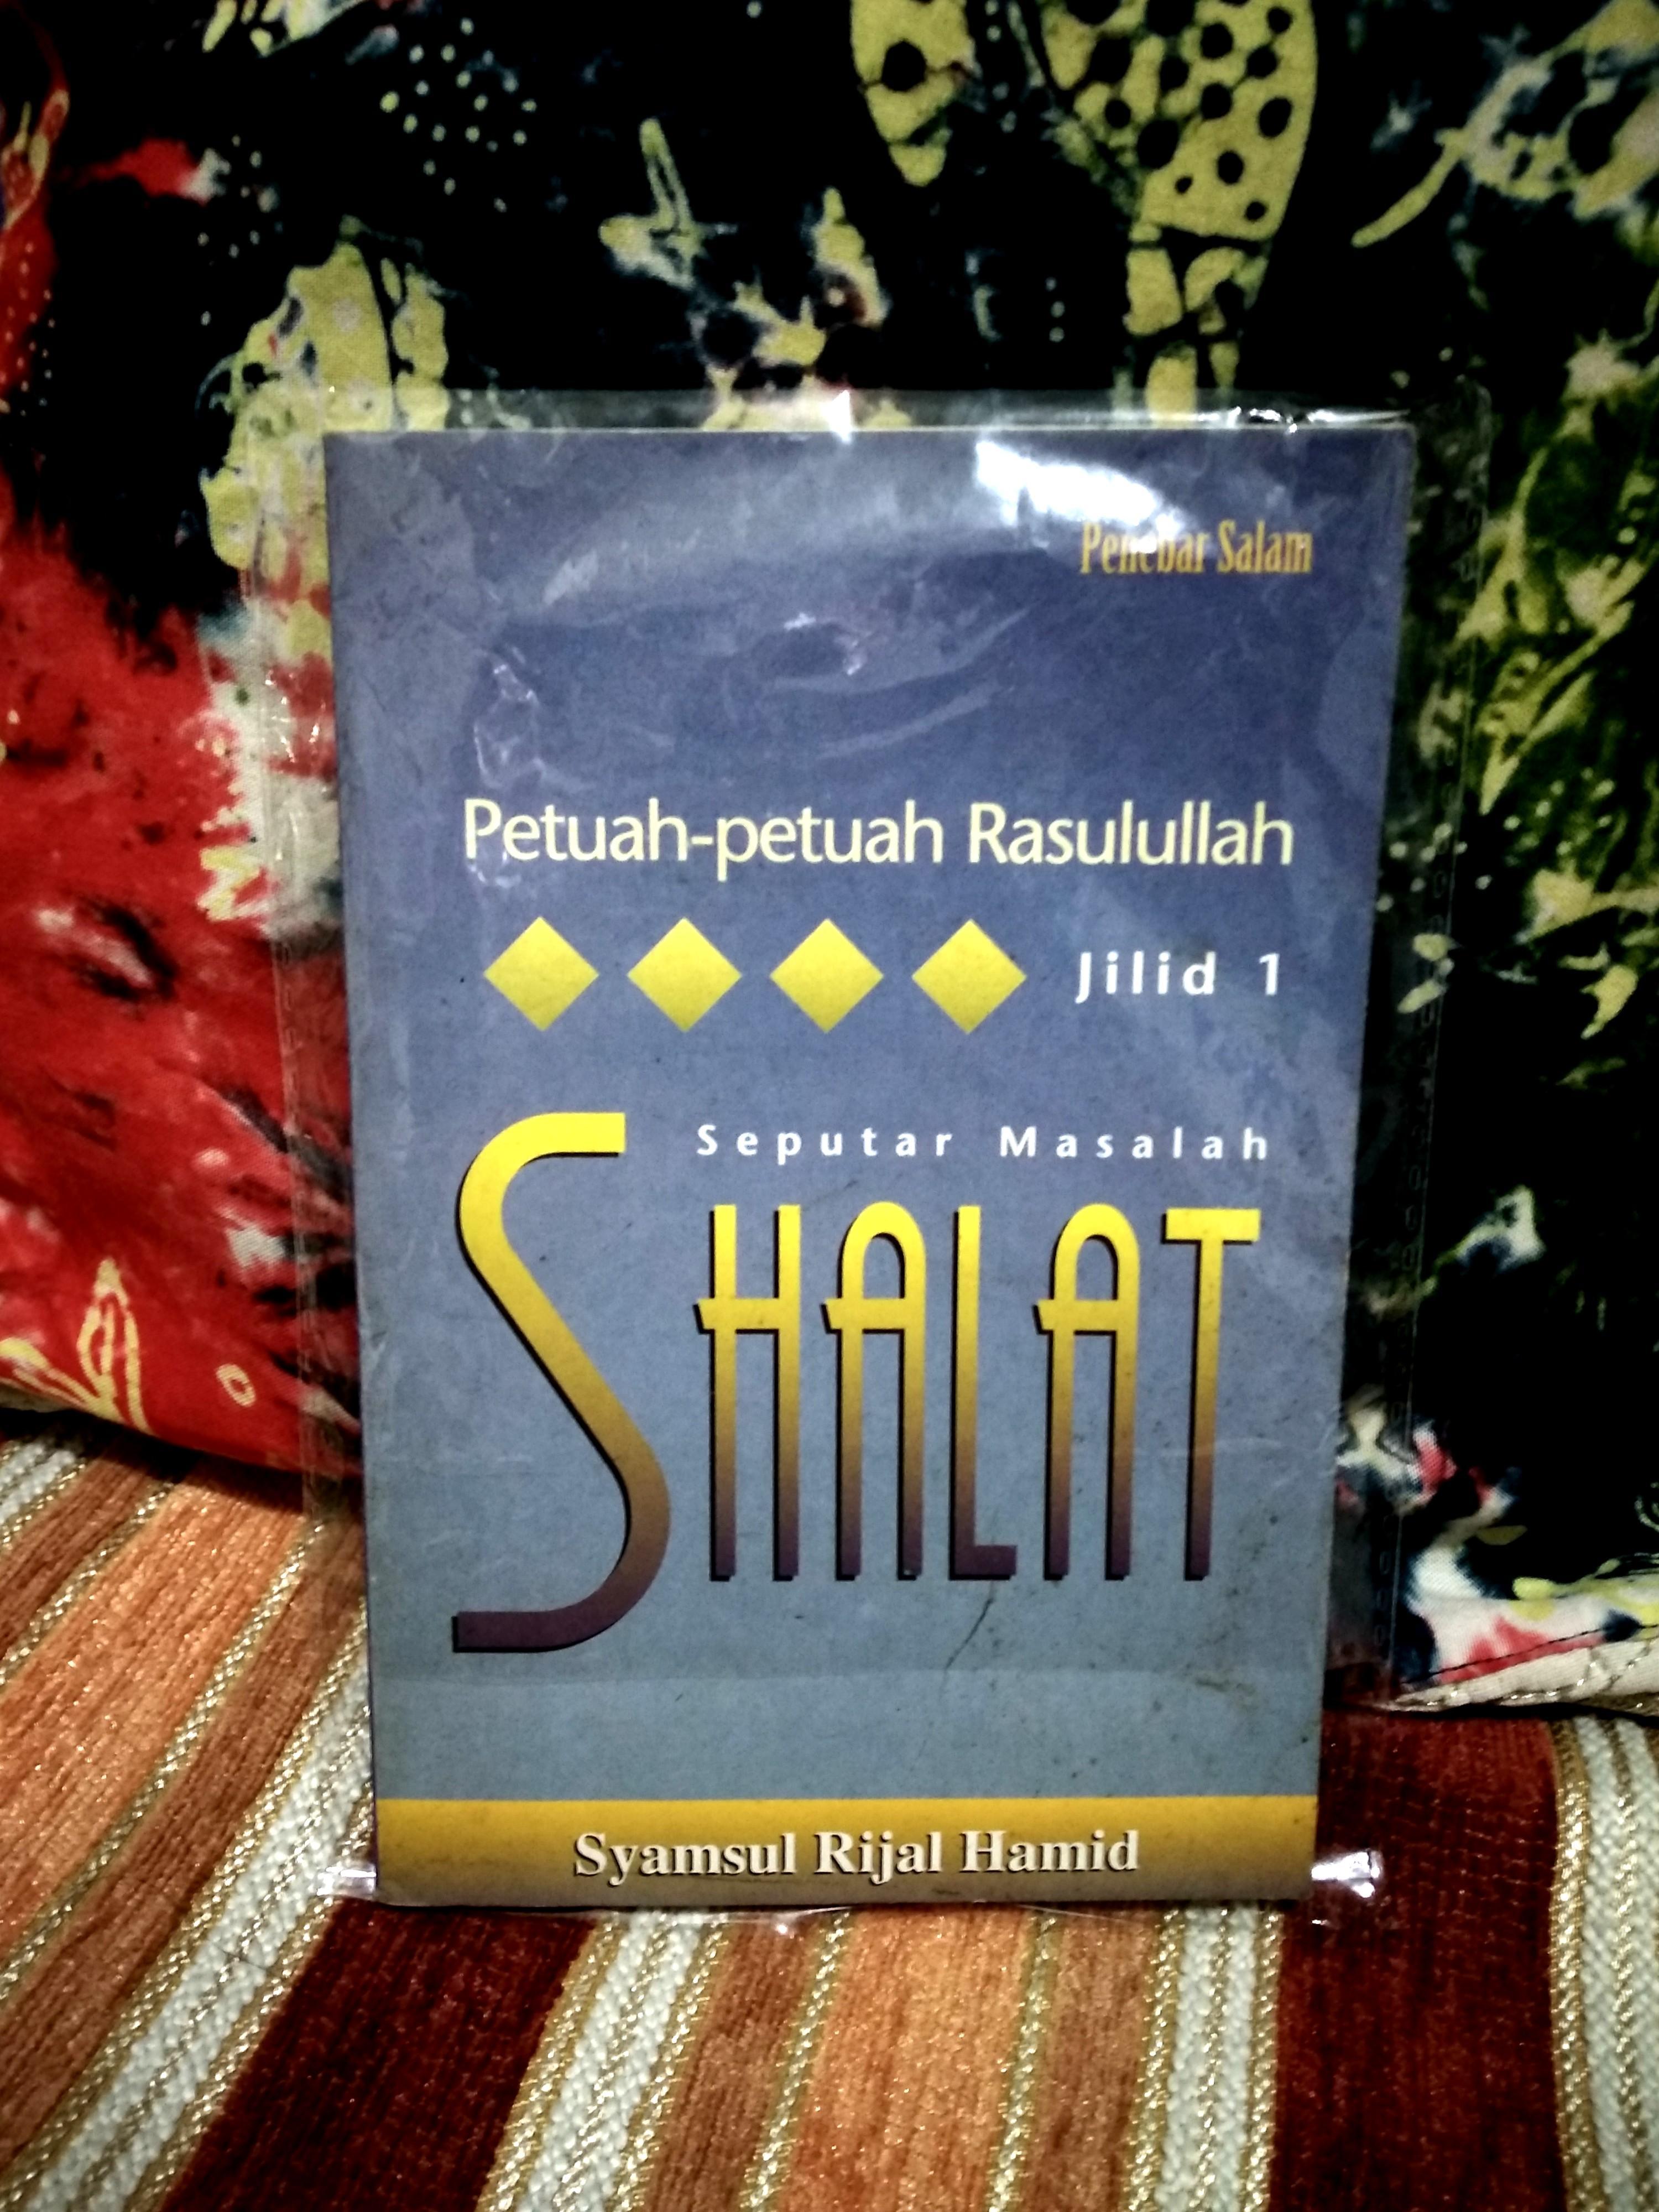 Buku Shalat, GRATIS!! Syarat: beli 1 produk lain disini